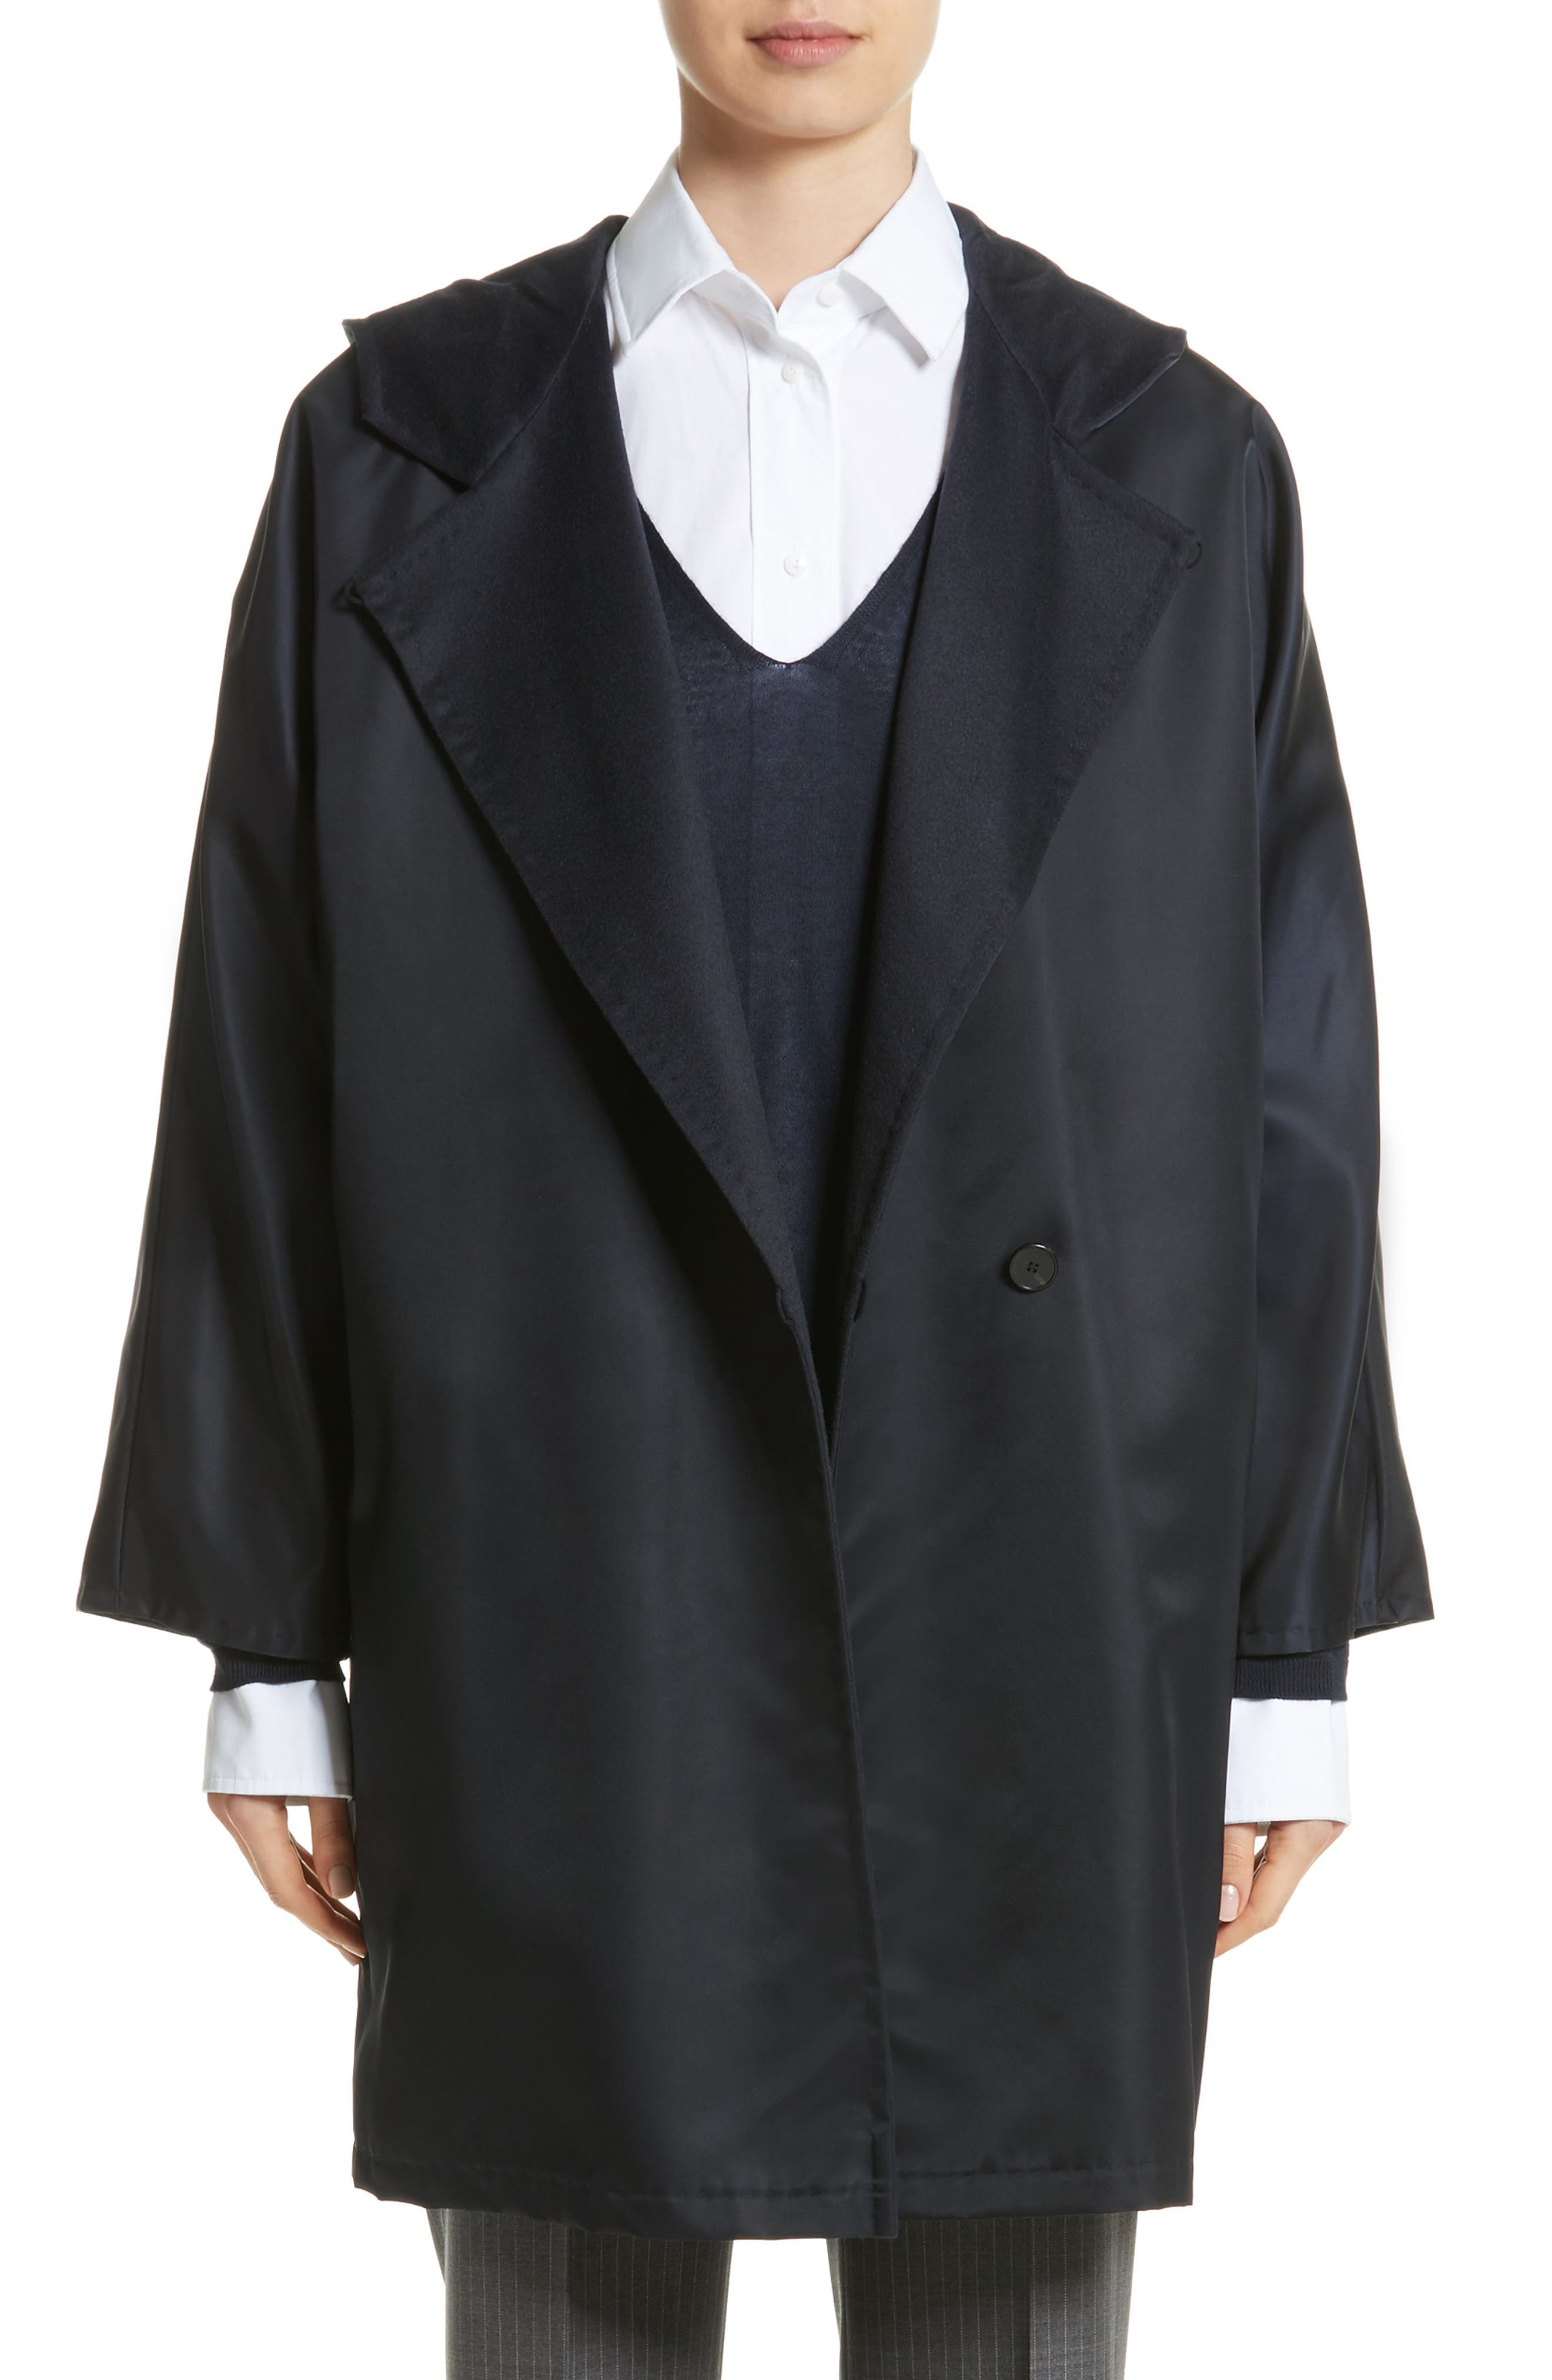 Jacopo Reversible Hooded Coat,                             Main thumbnail 1, color,